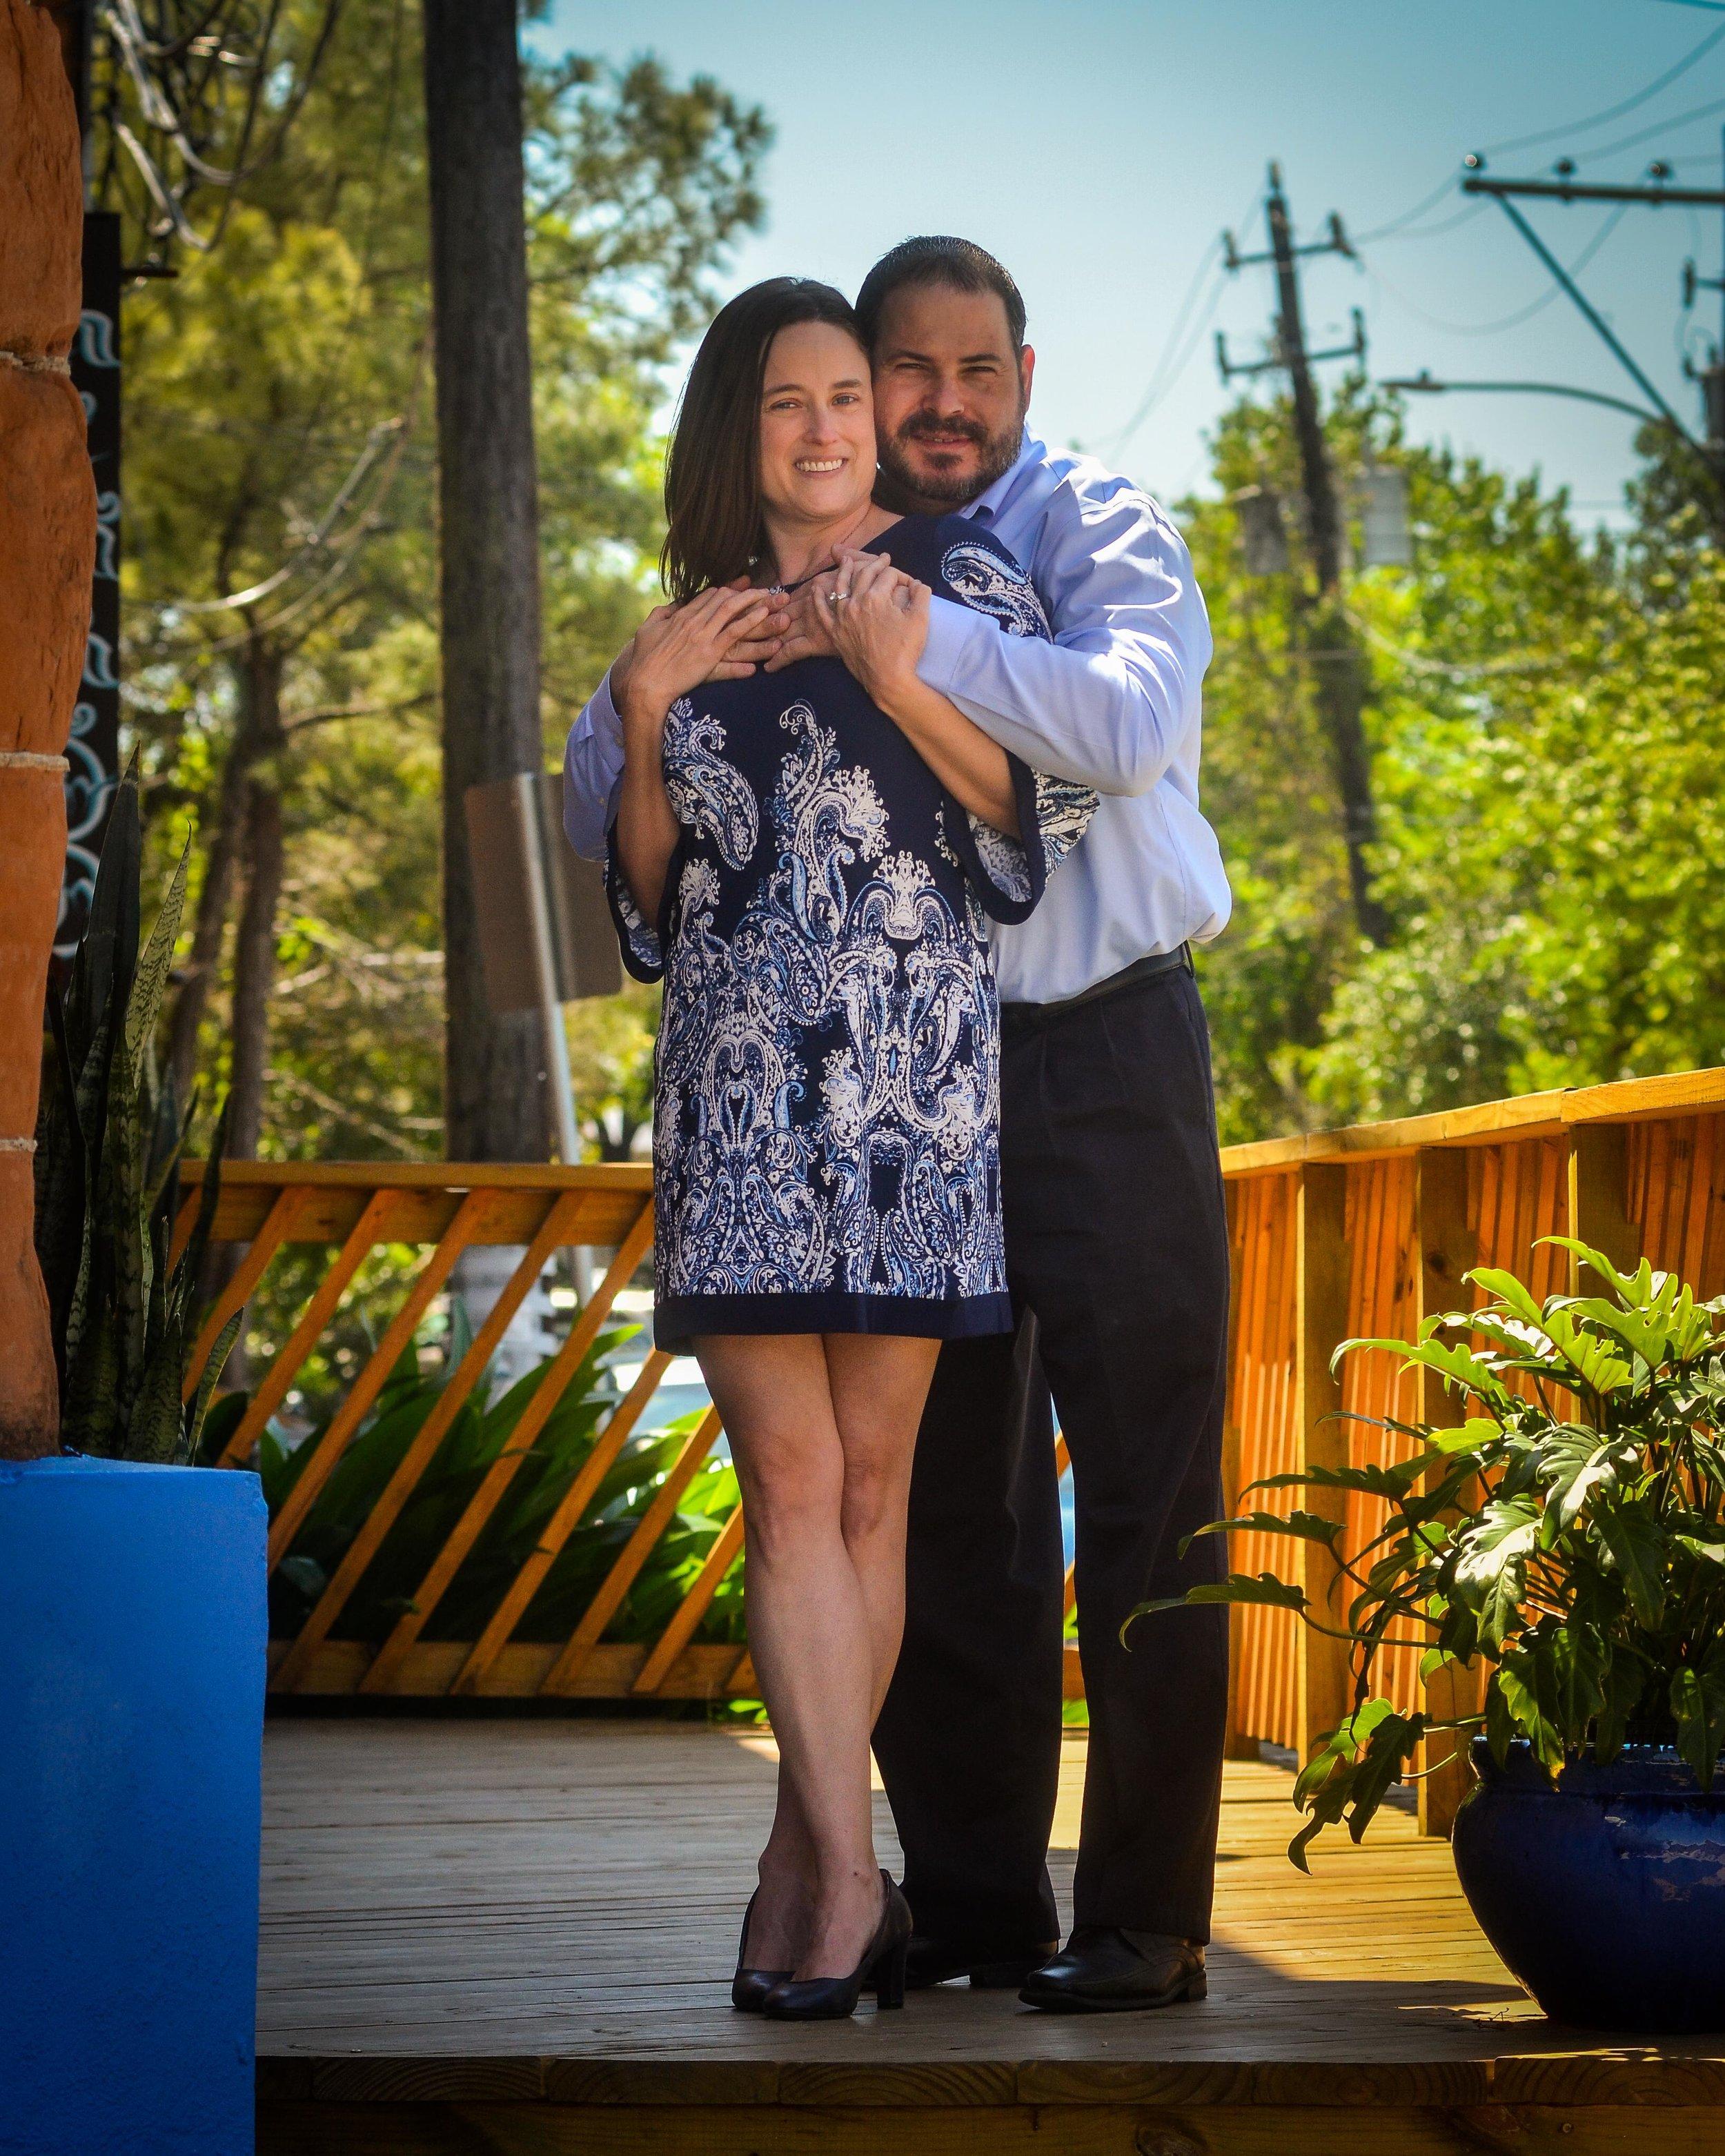 Katherine and Brandon wish to adopt